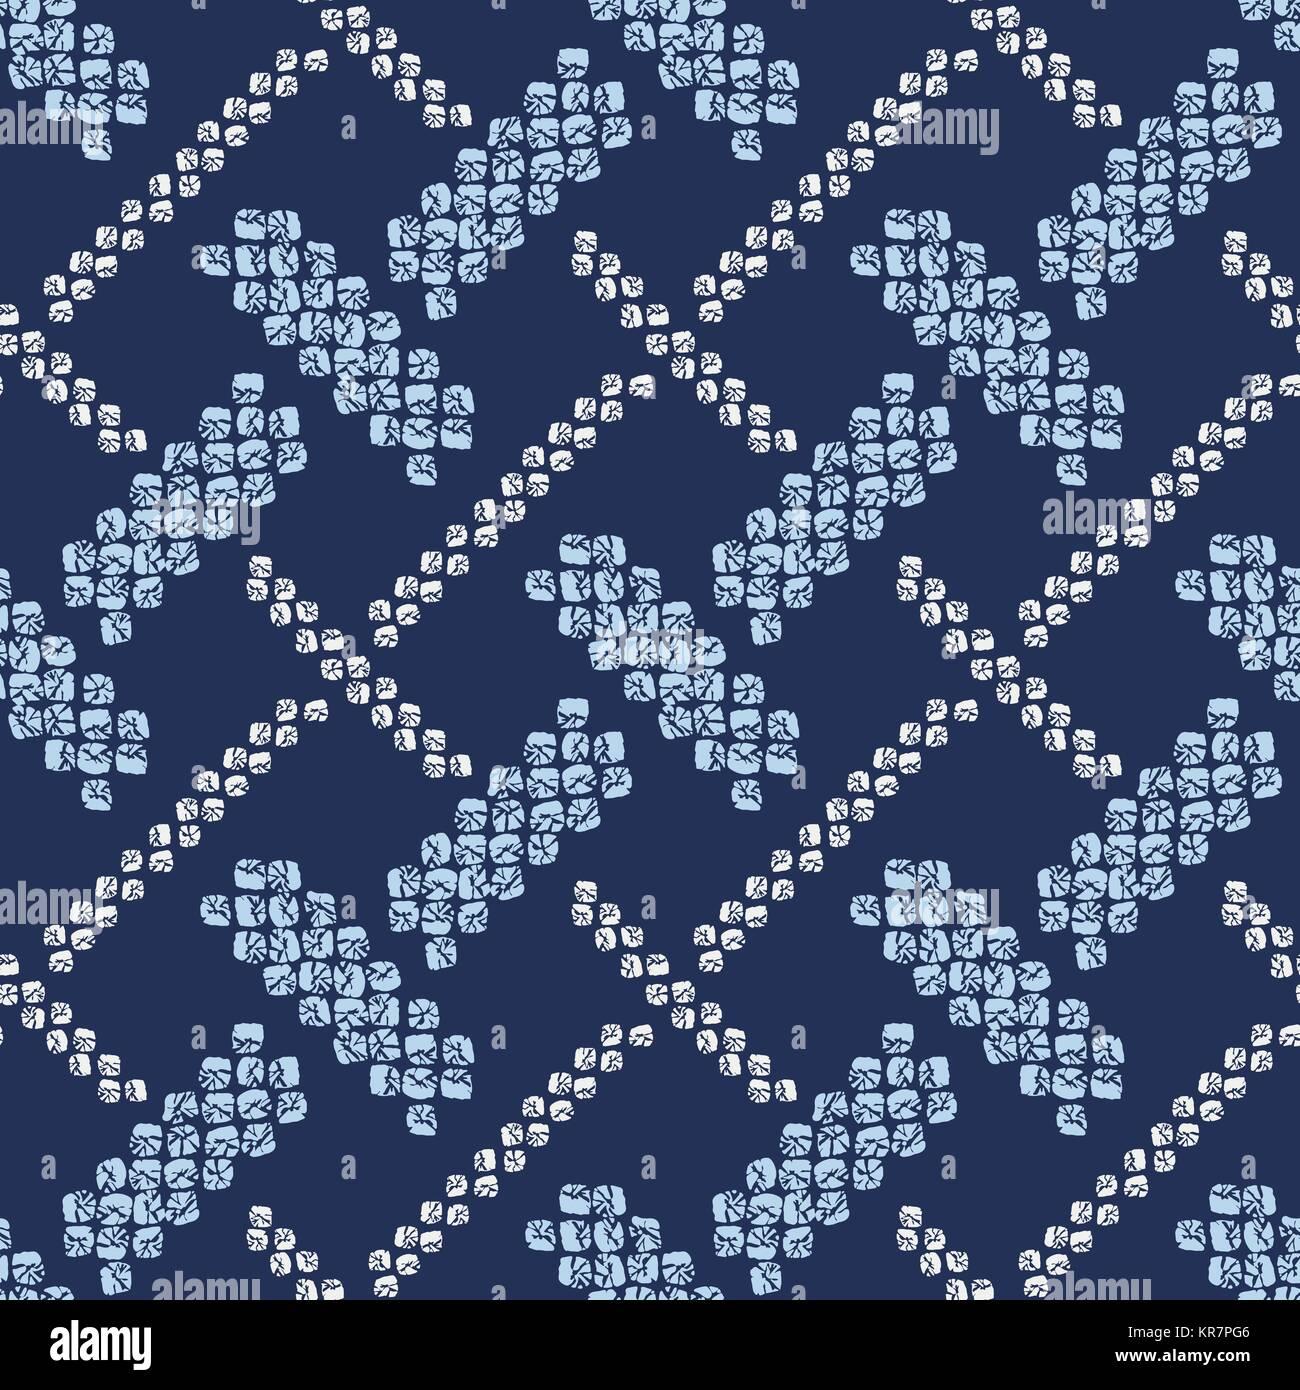 Shibori ornament. Weaving motif. Asian seamless pattern. Dark indigo background. Classic japanese dyeing technique. - Stock Vector